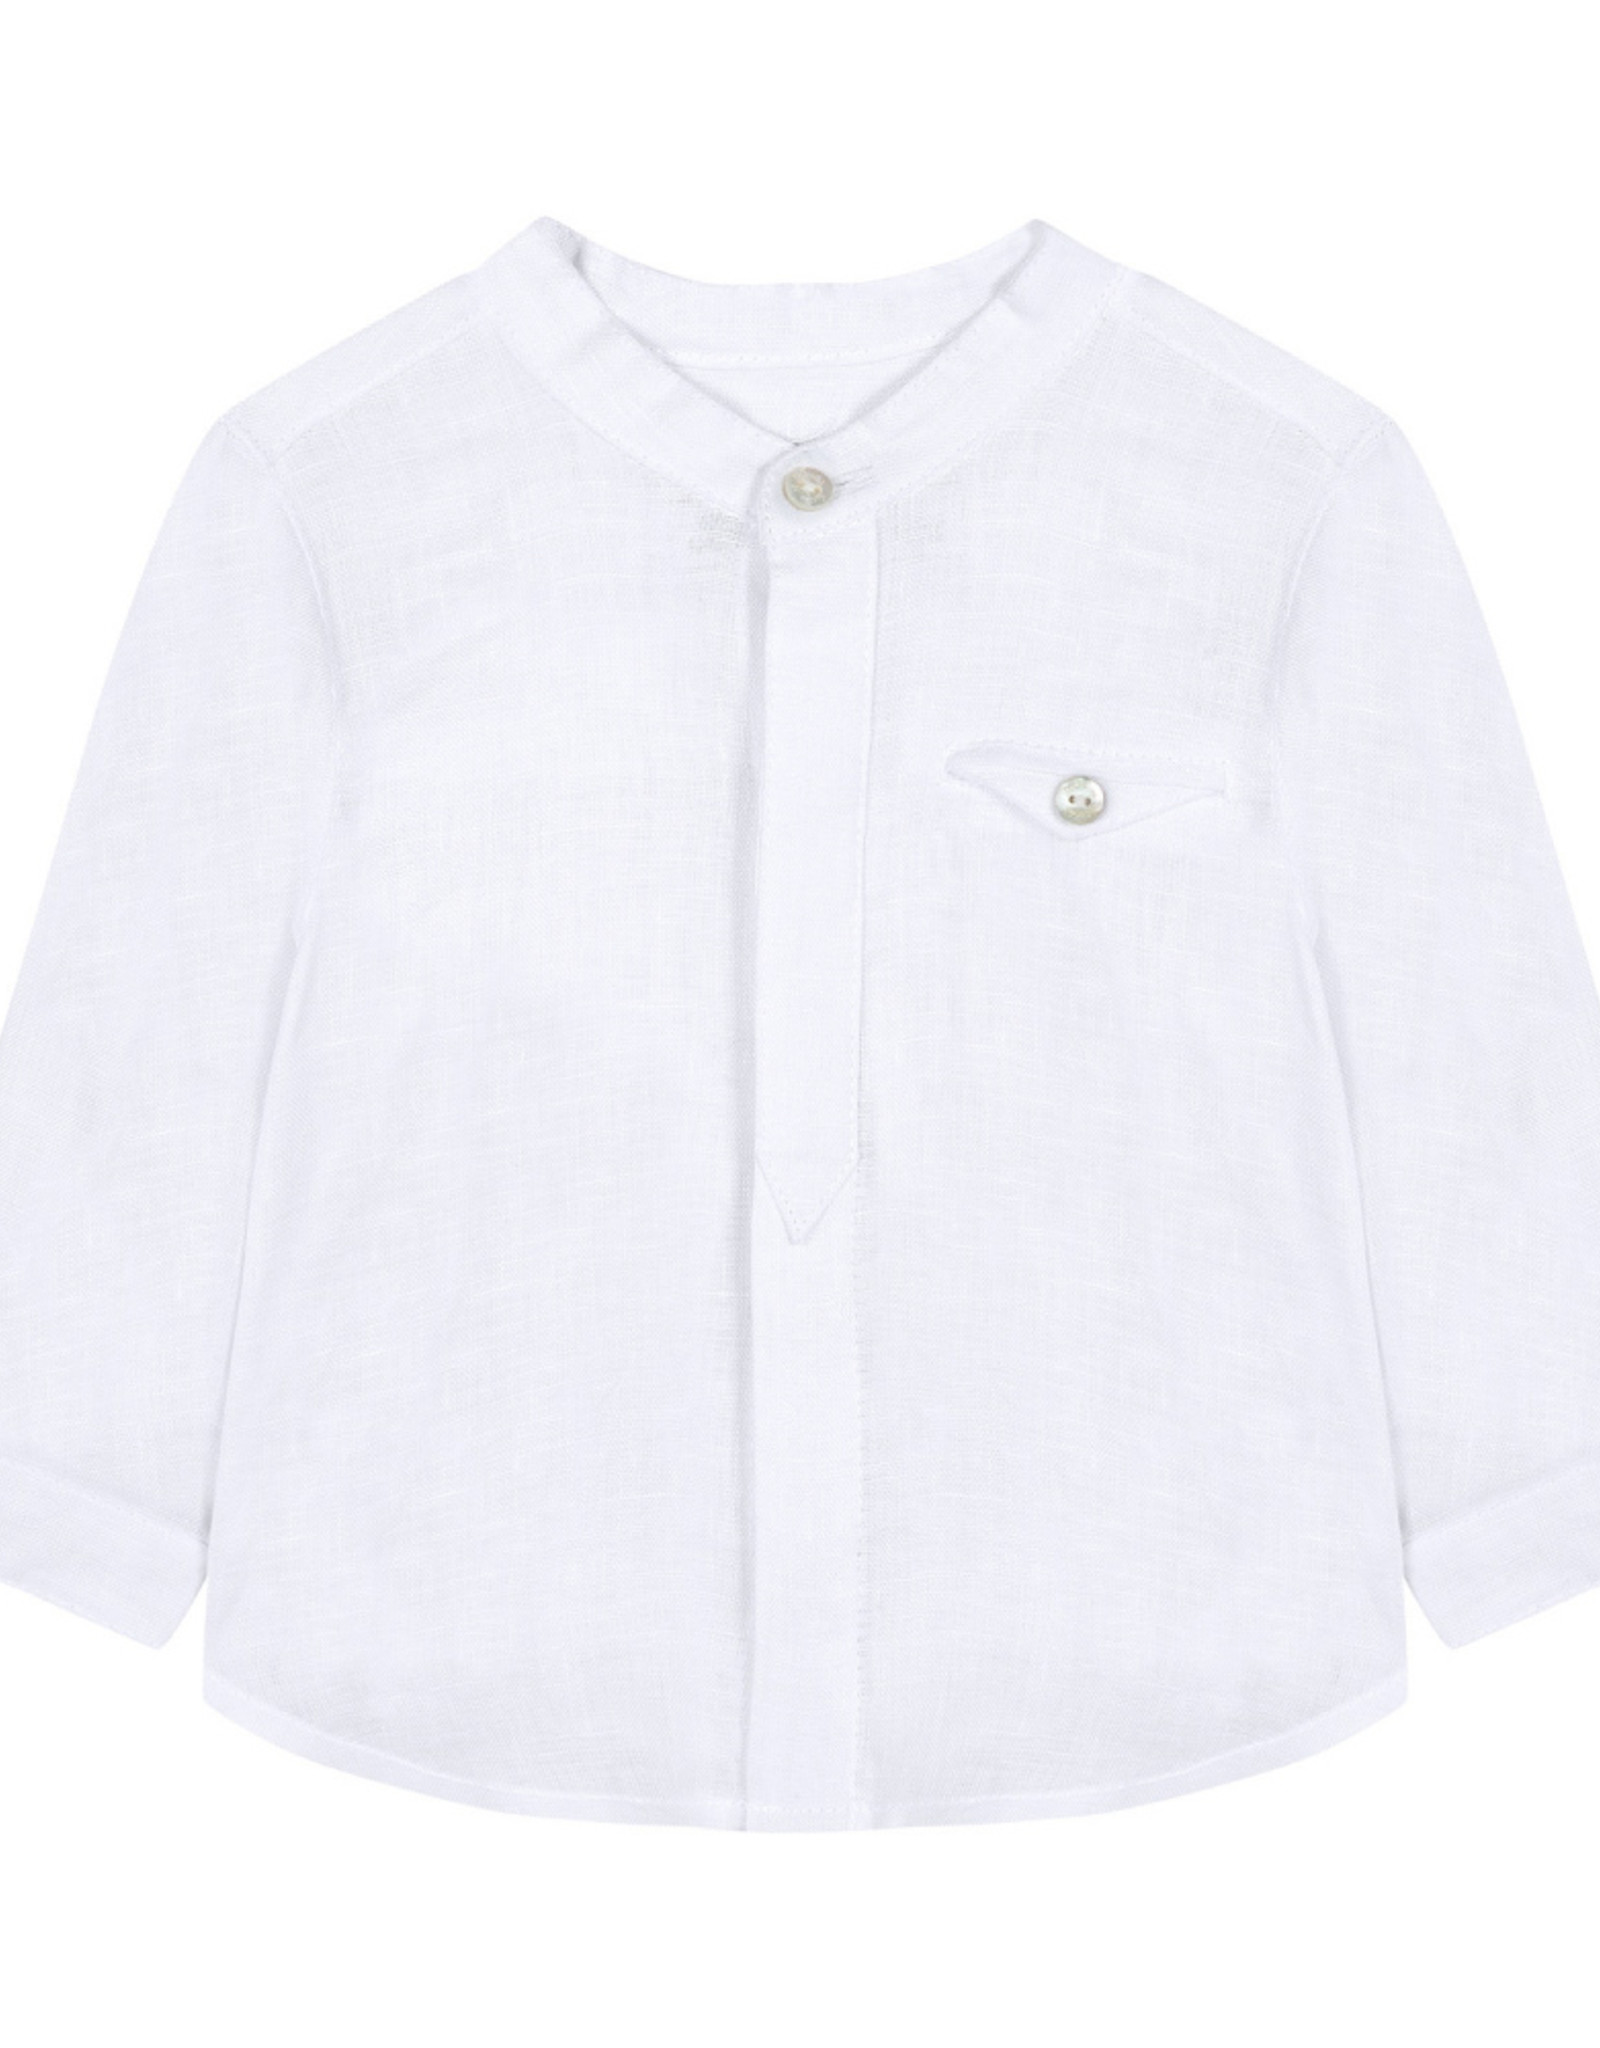 Tartine et Chocolat Linen baby shirt